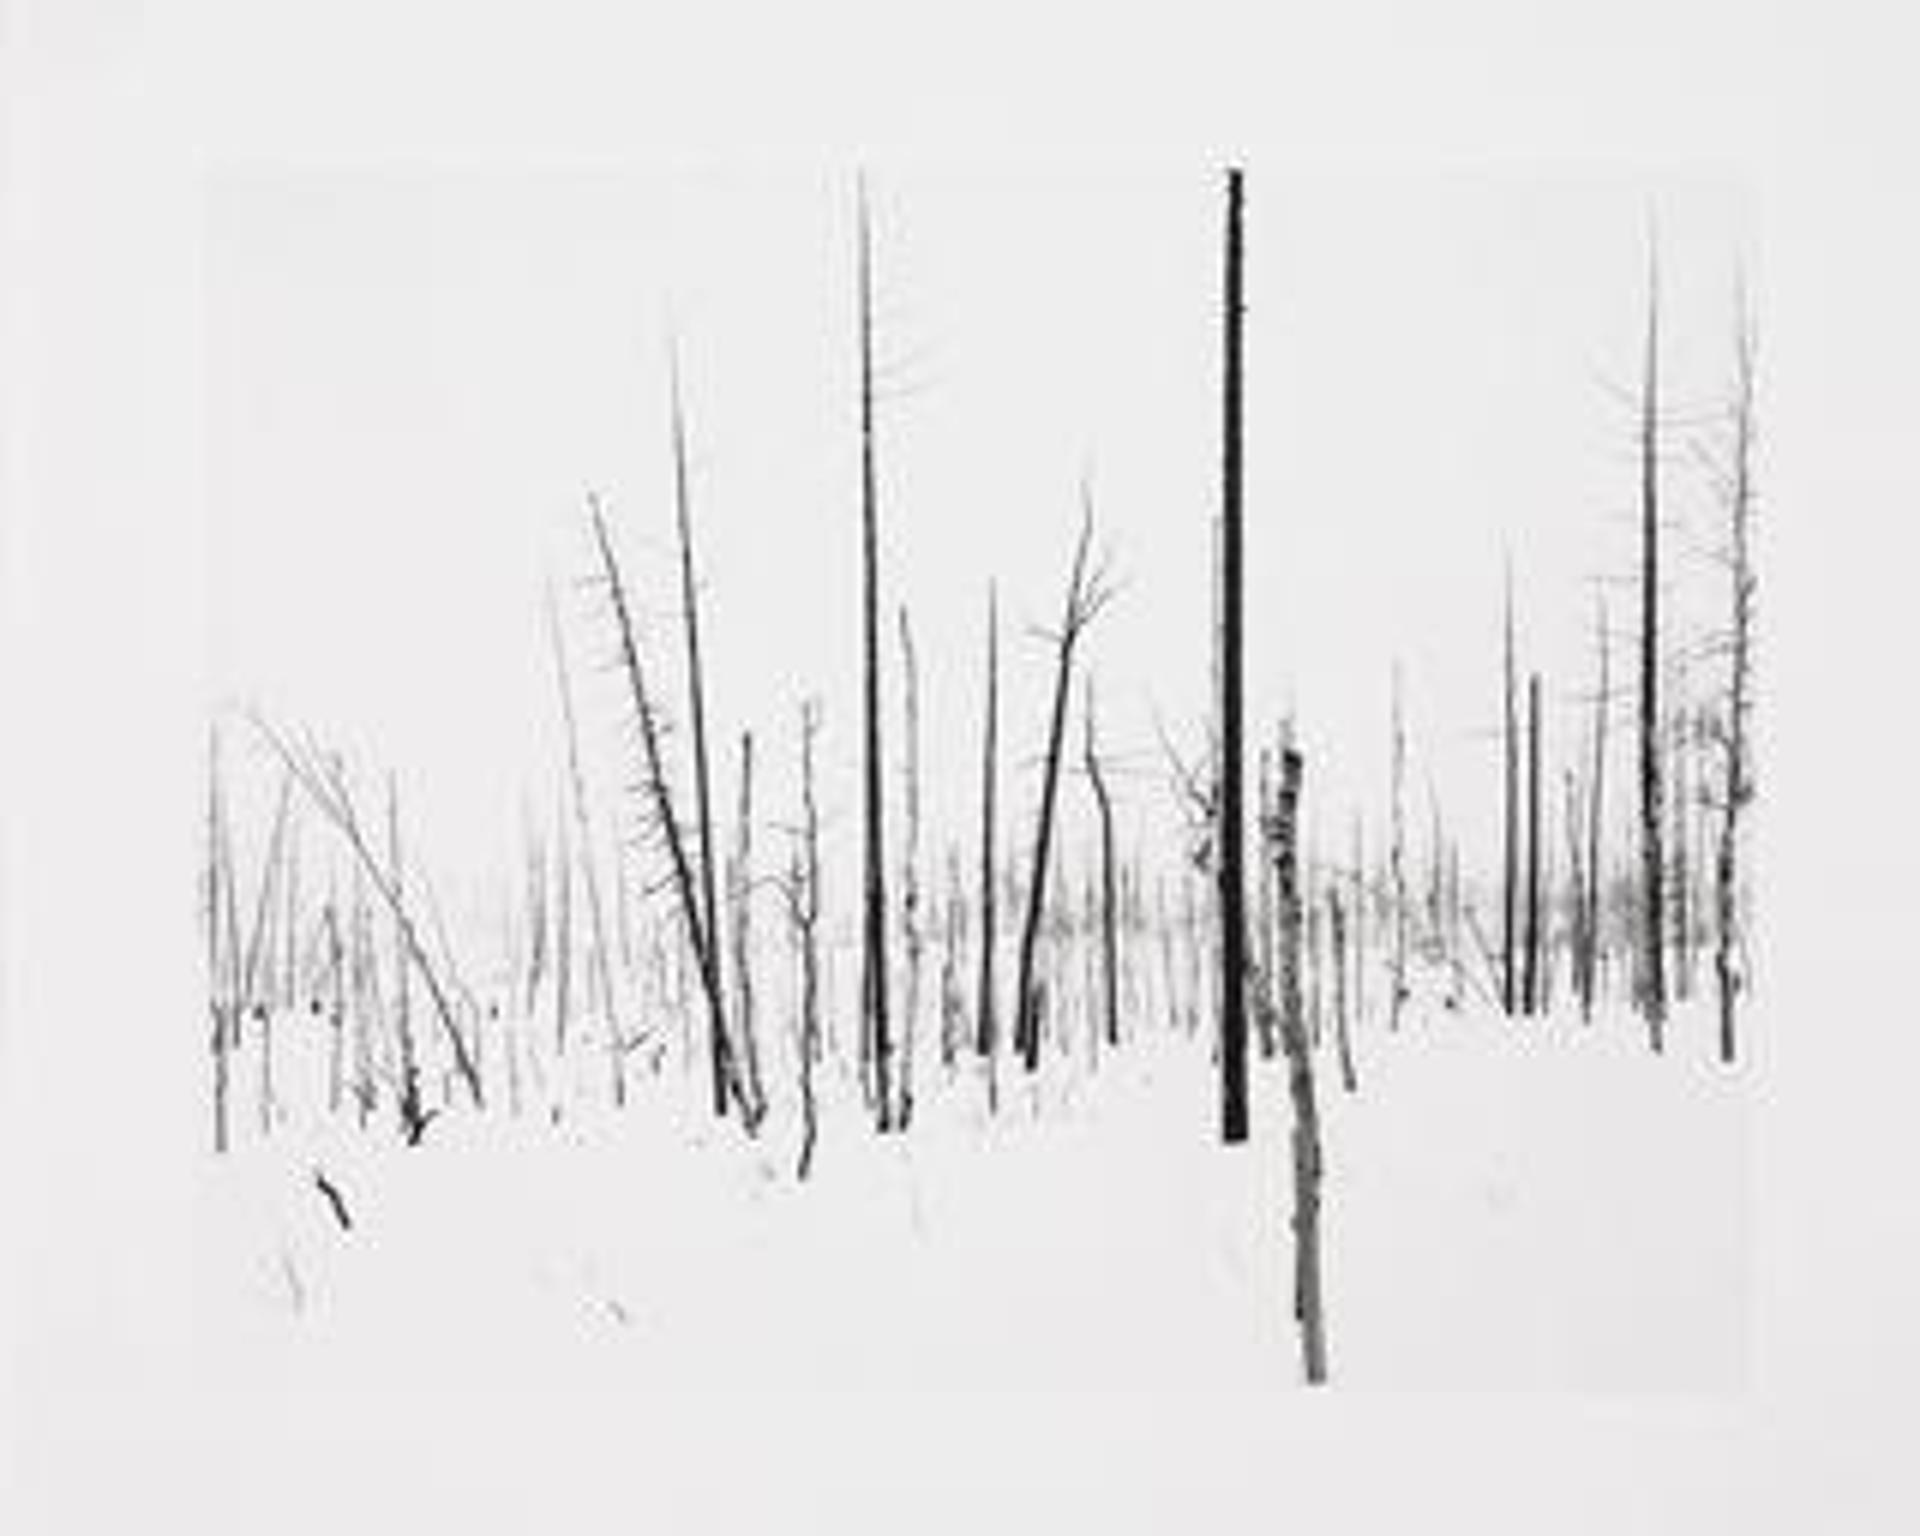 Norilsk (Portfolio) by Darren Almond